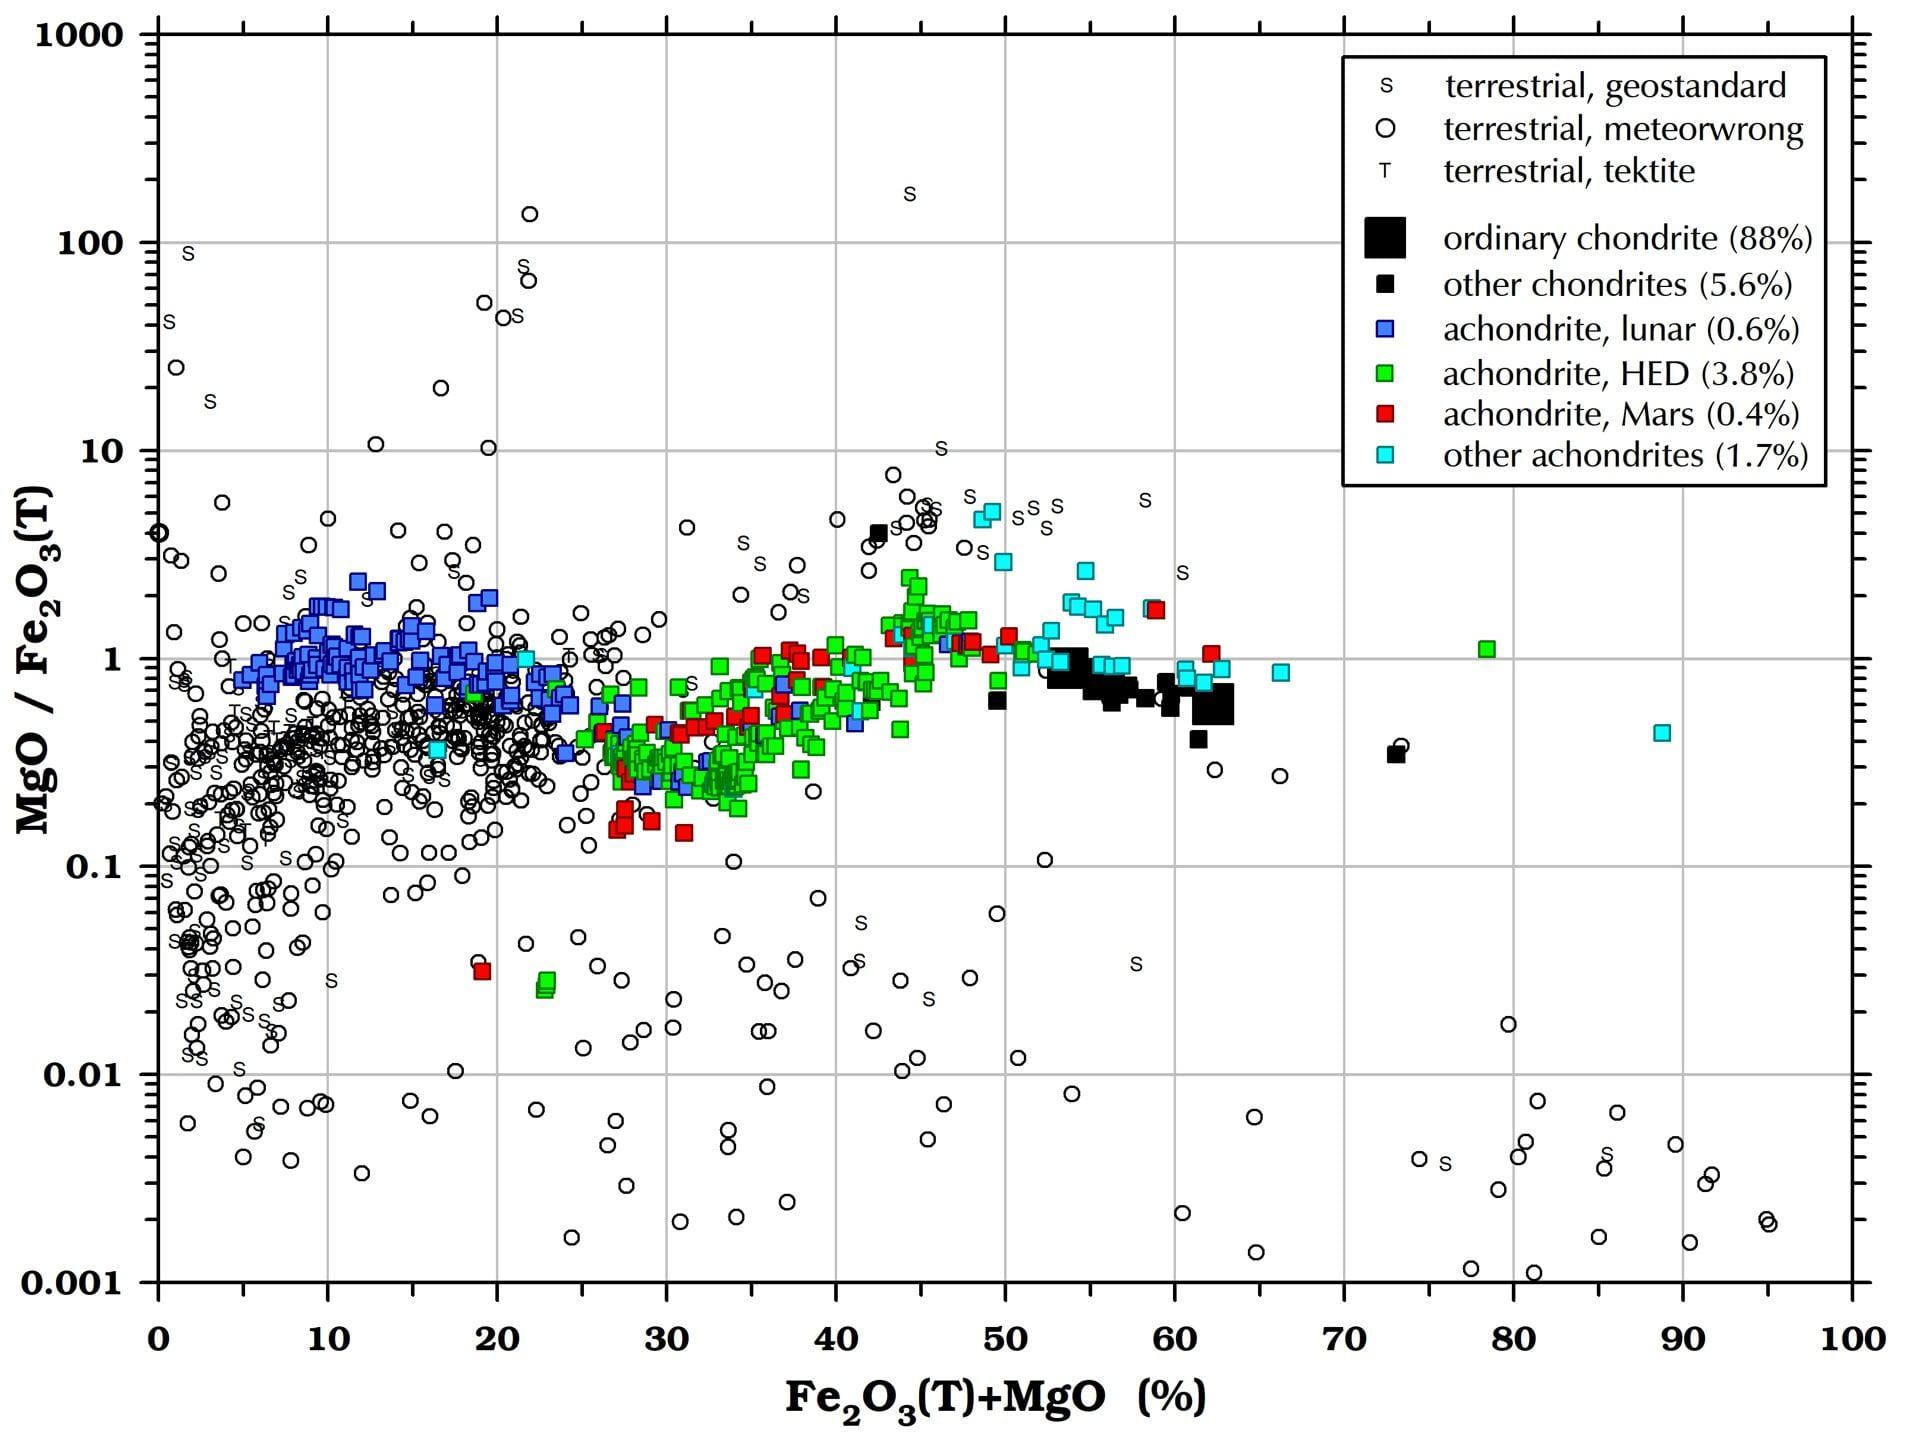 MgO/Fe2O3 in meteorites and terrestrial rocks